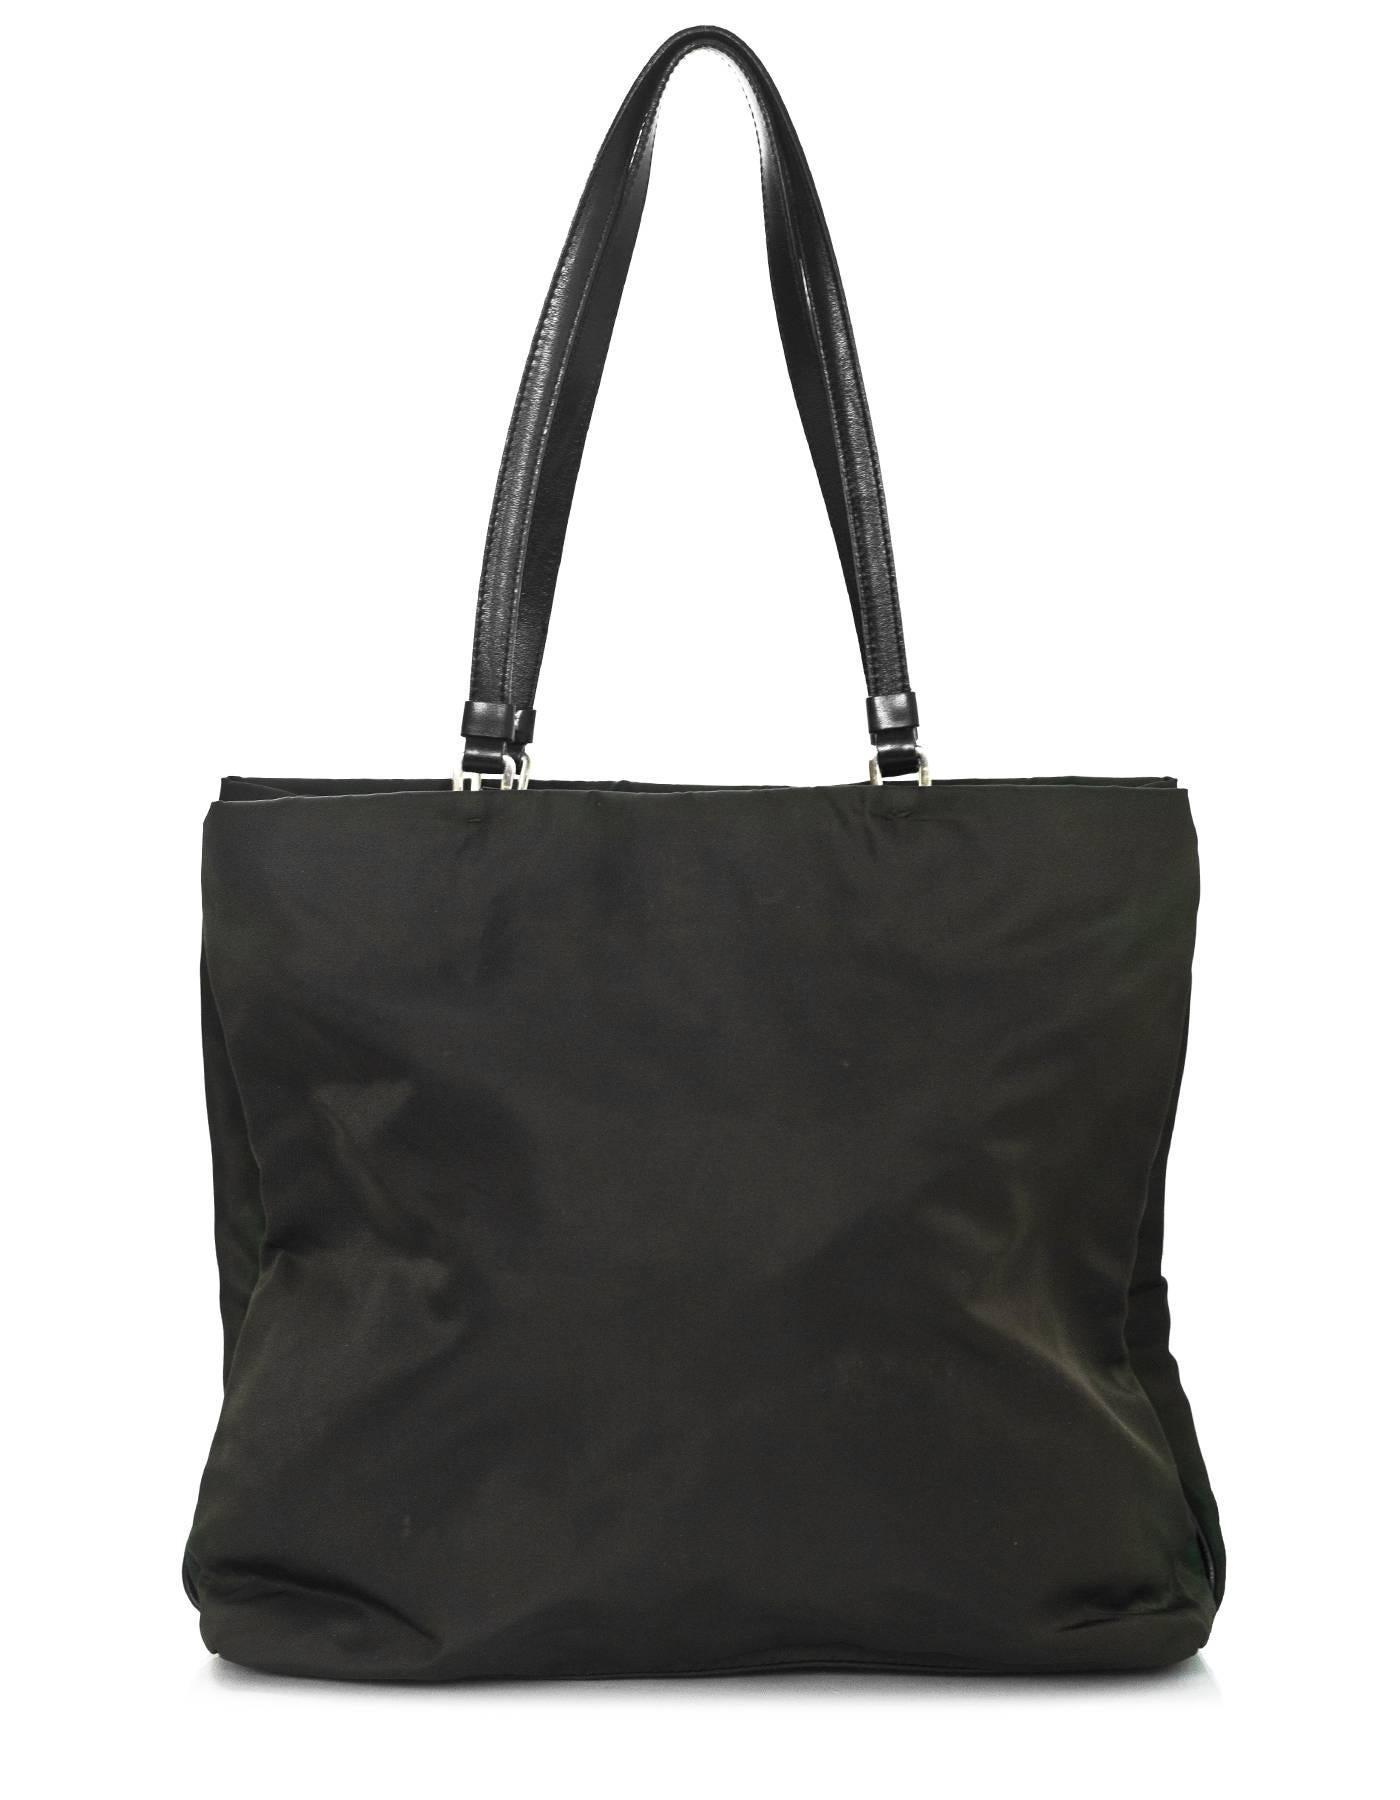 d4d5e7985695 discount code for prada tessuto nylon tote bag 15b06 a0e9d  best price  black prada dark green tessuto nylon tote bag for sale 29fa4 927f9